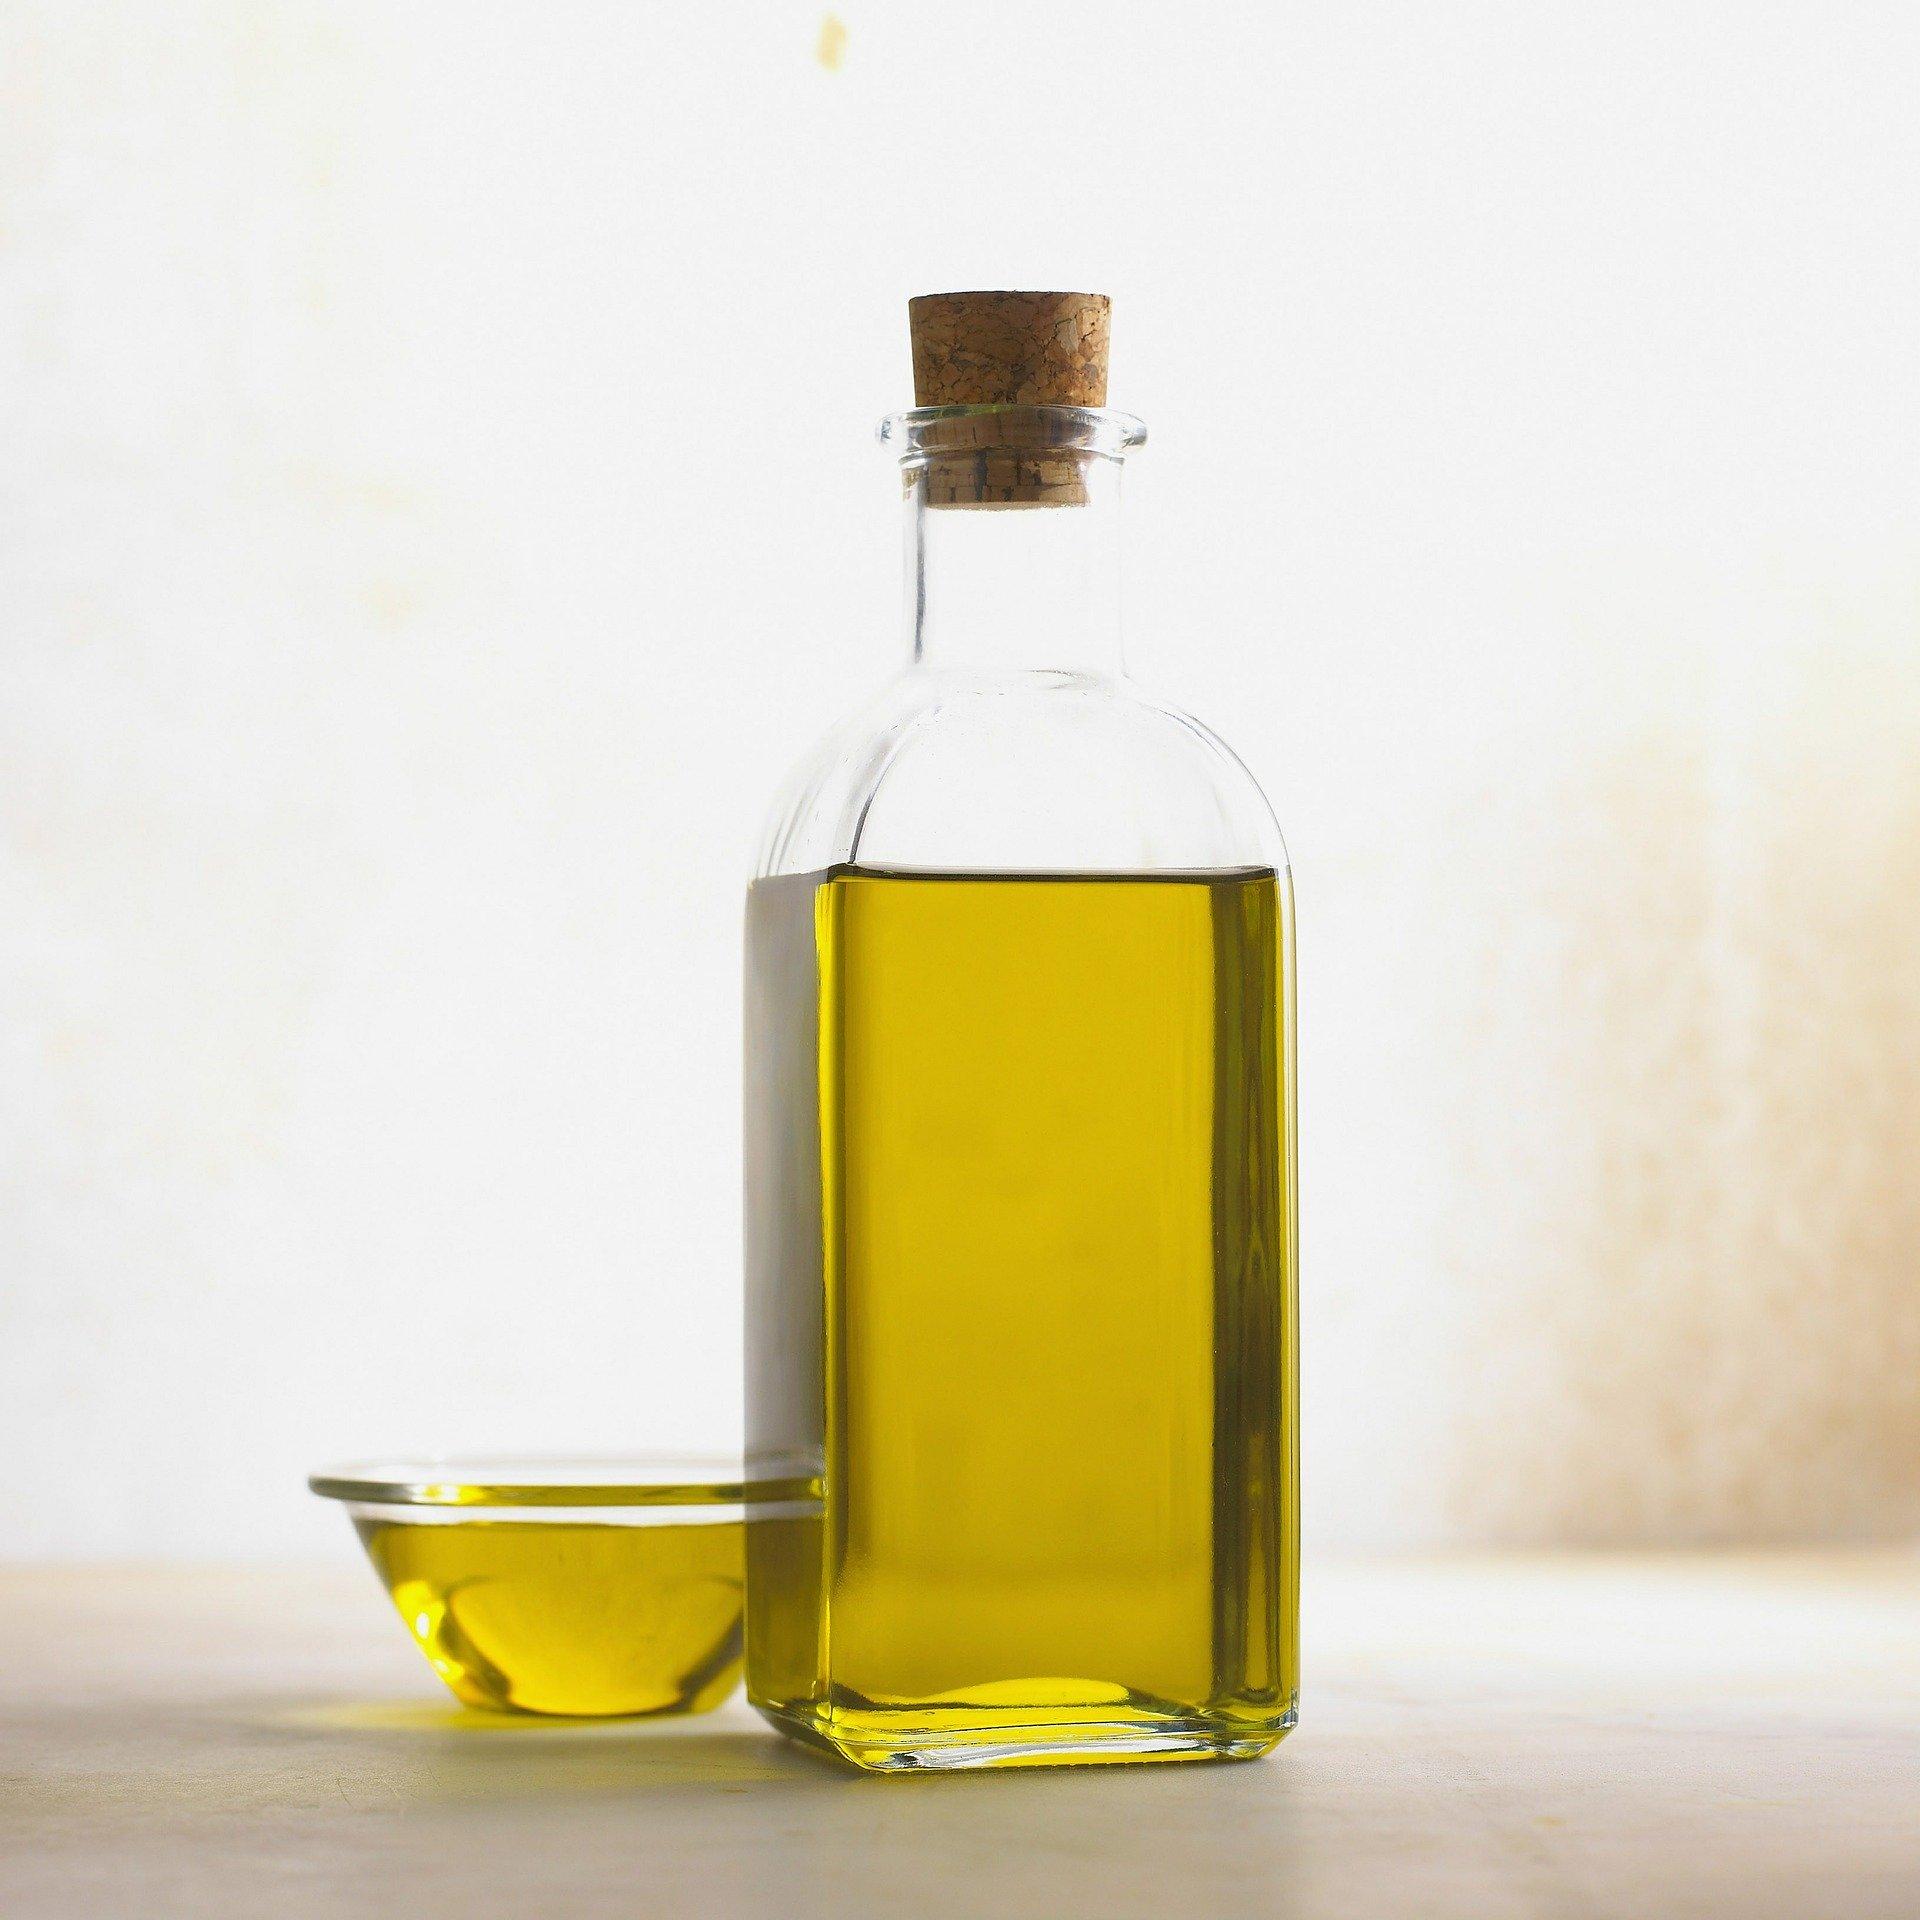 Onion hair oil for Hair growth